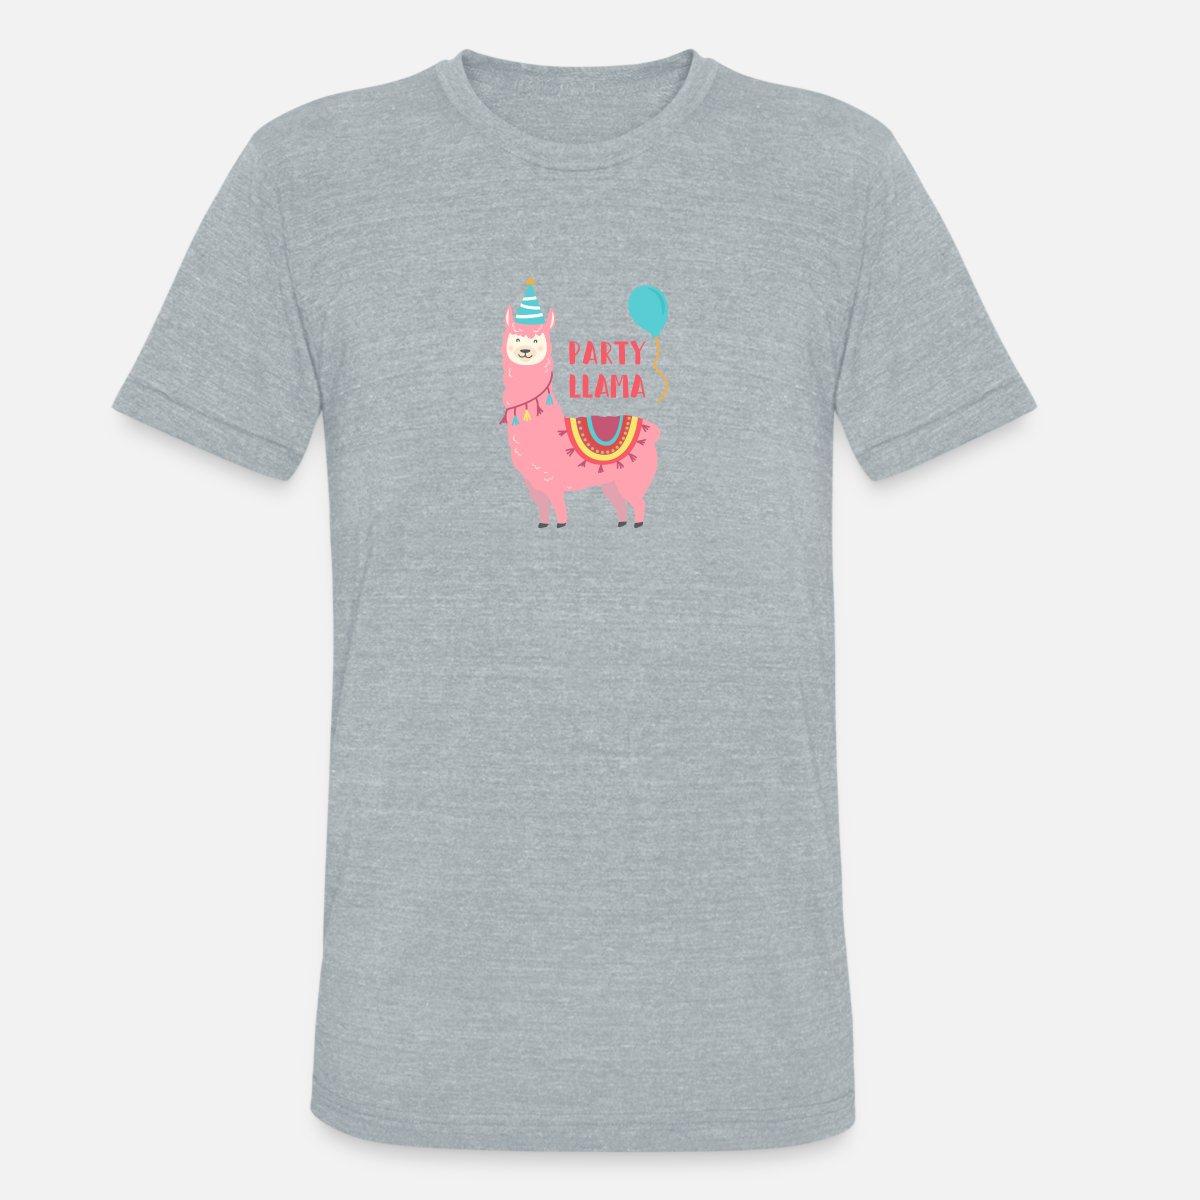 229a1a7ad Funny Animal T Shirt Designs - DREAMWORKS